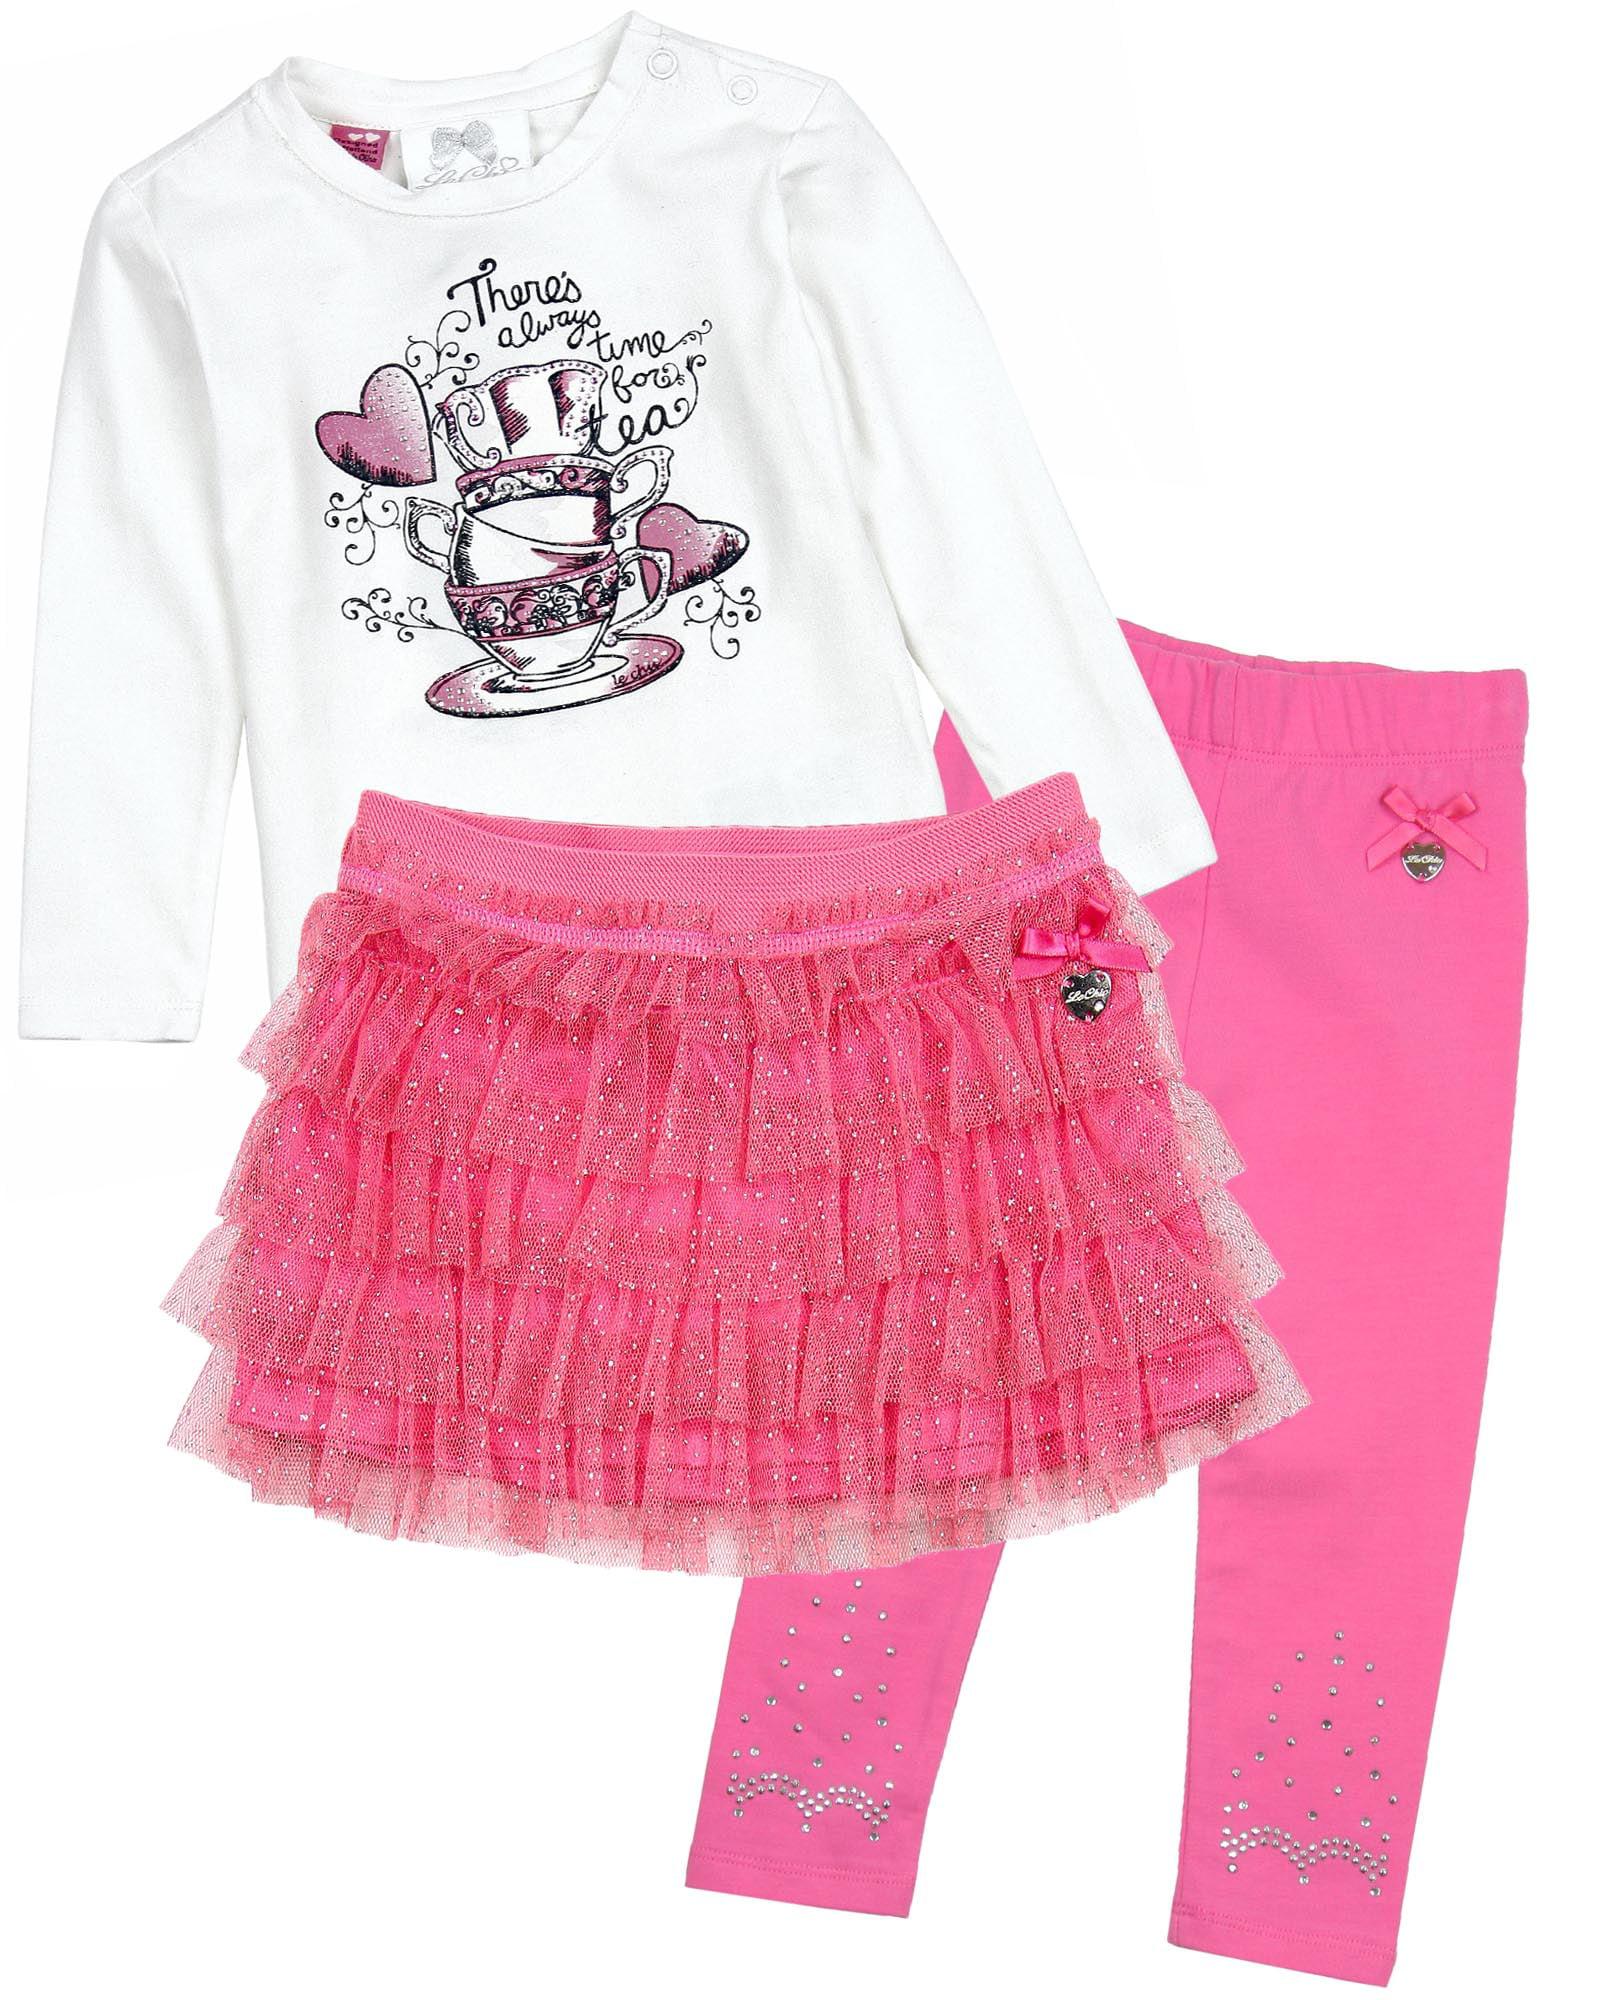 Sizes 12M-24M Le Chic Baby Girls Glitter Skirt